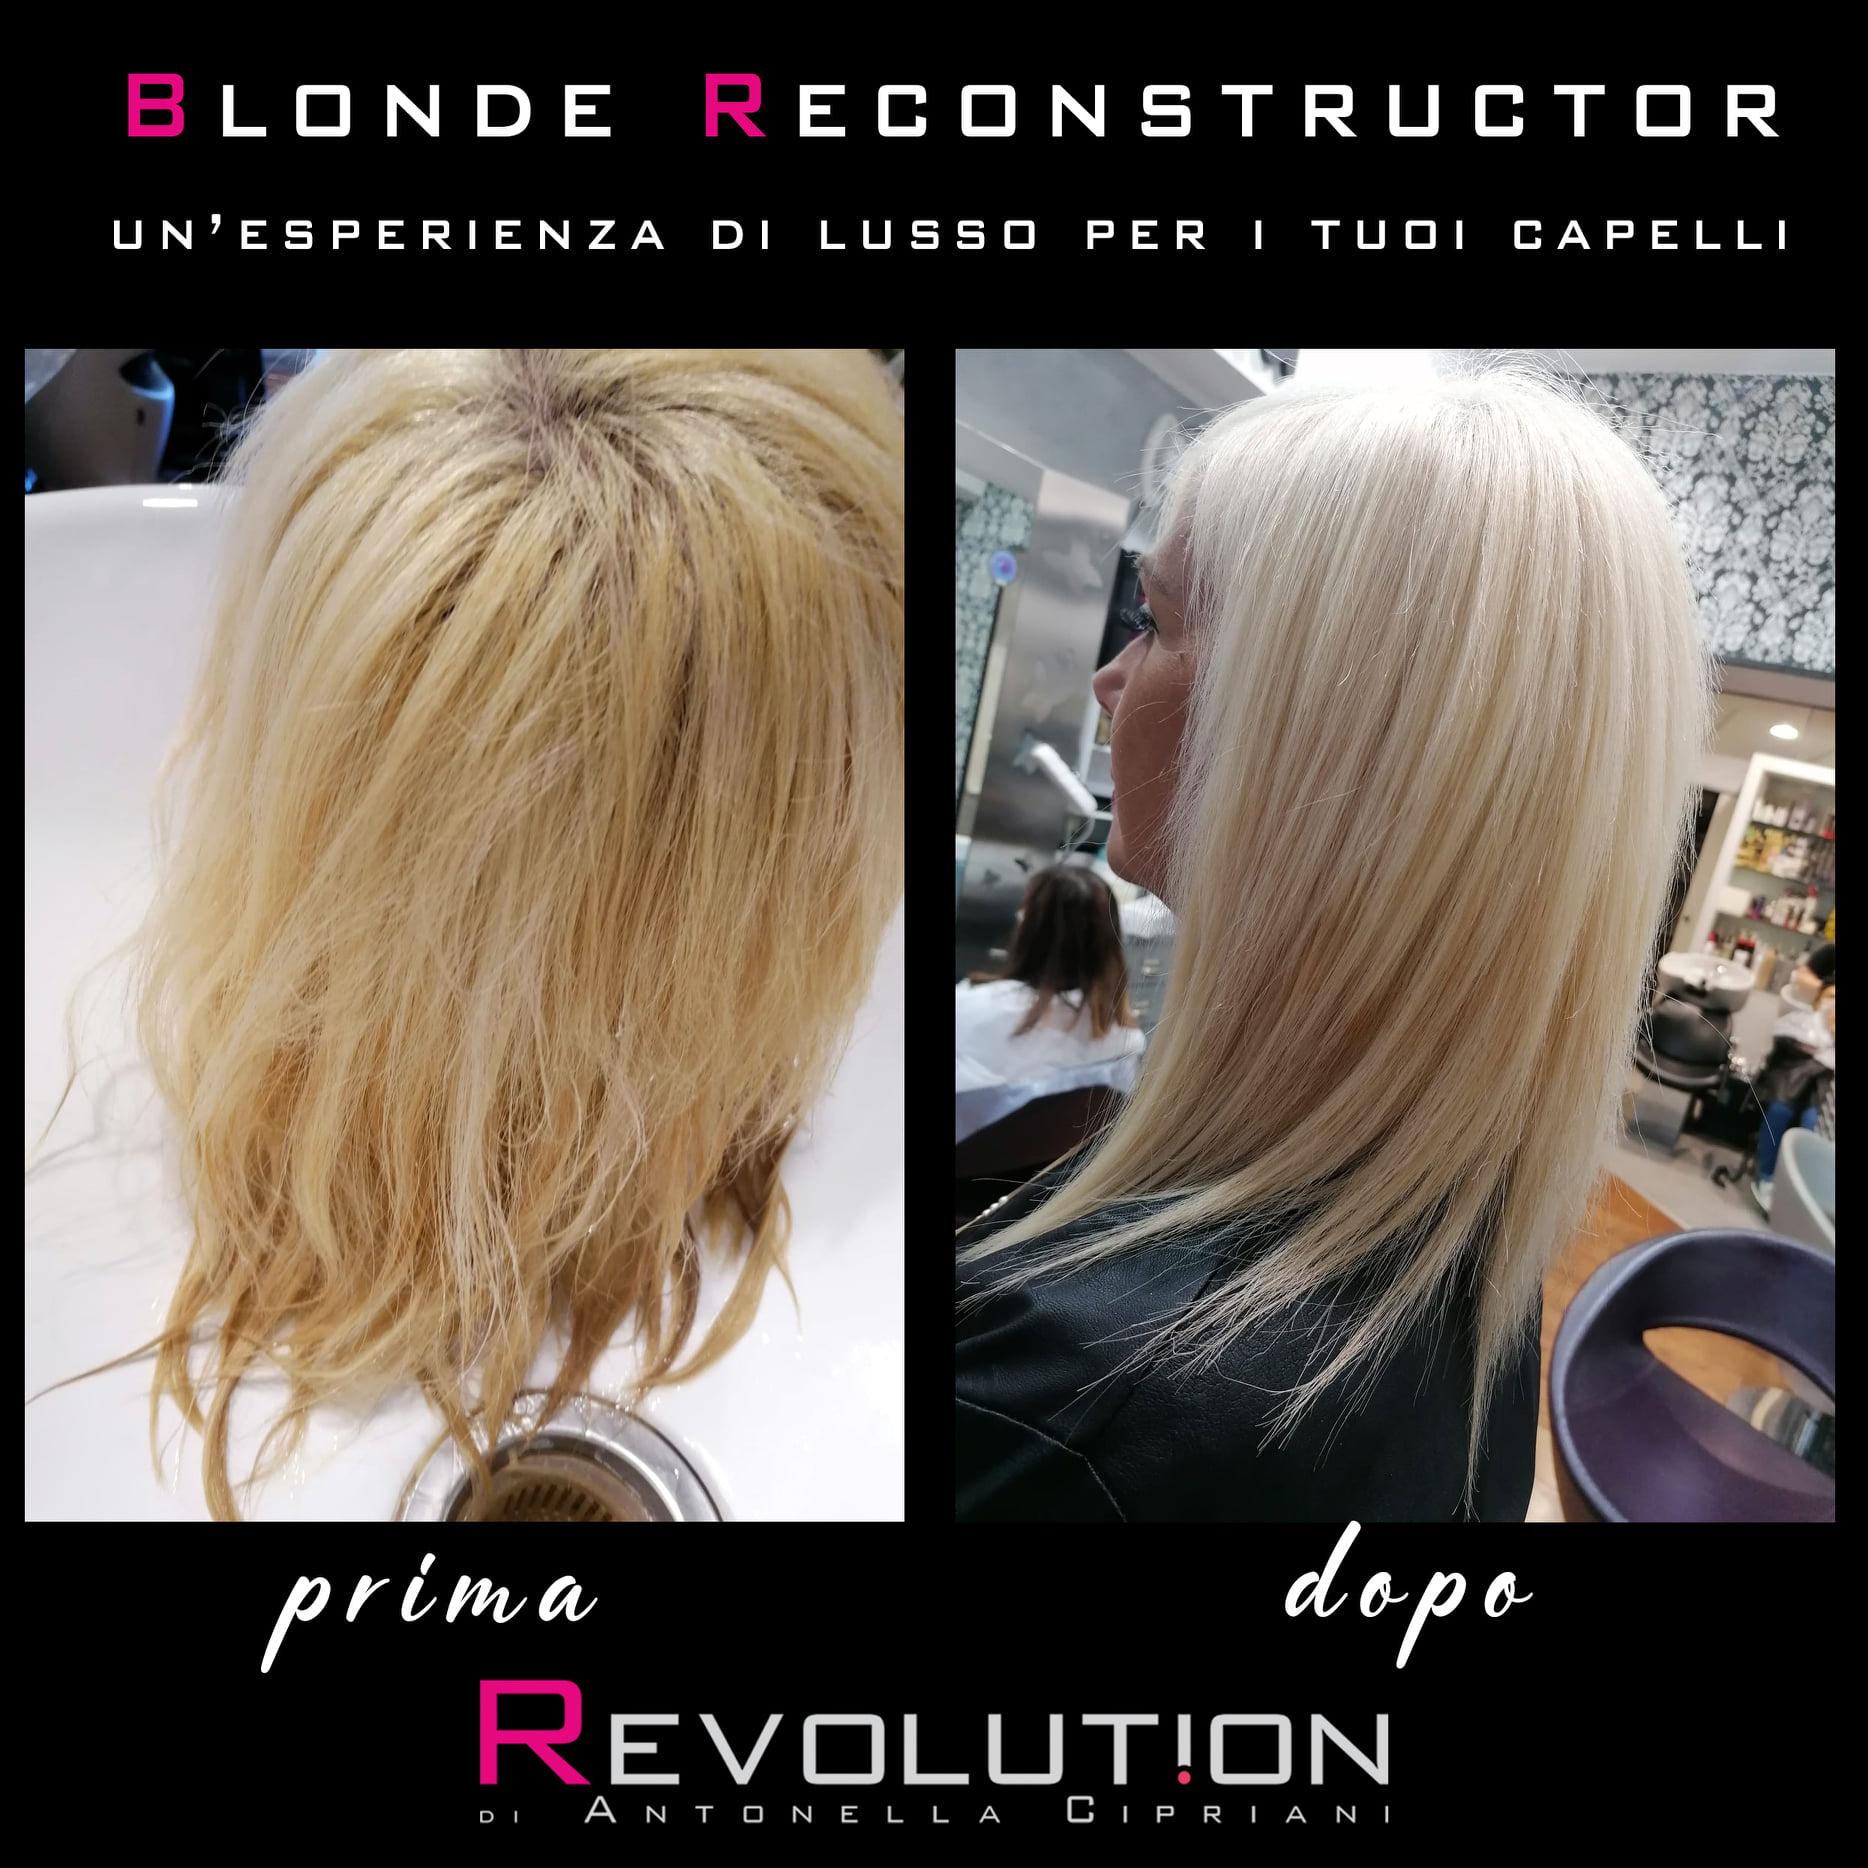 Blonde Reconstructor